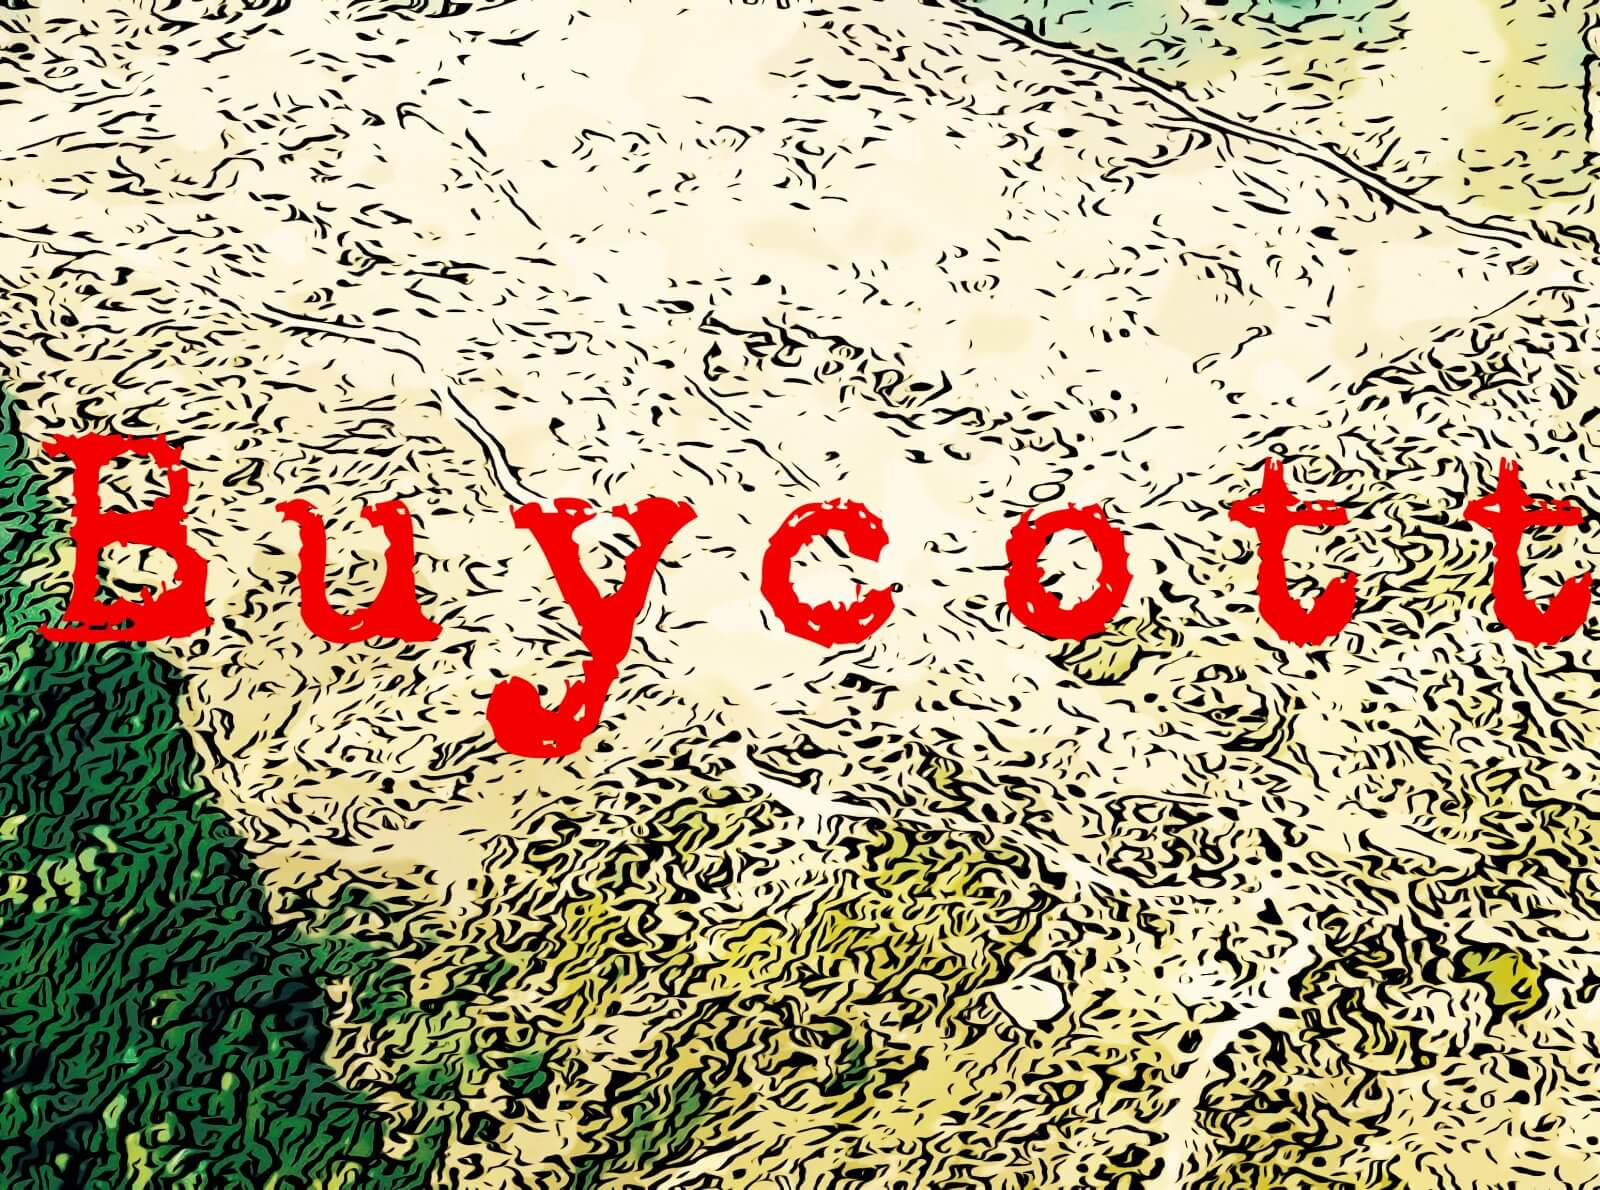 #Buycott! Soia Ogm olio di palma e carni americane